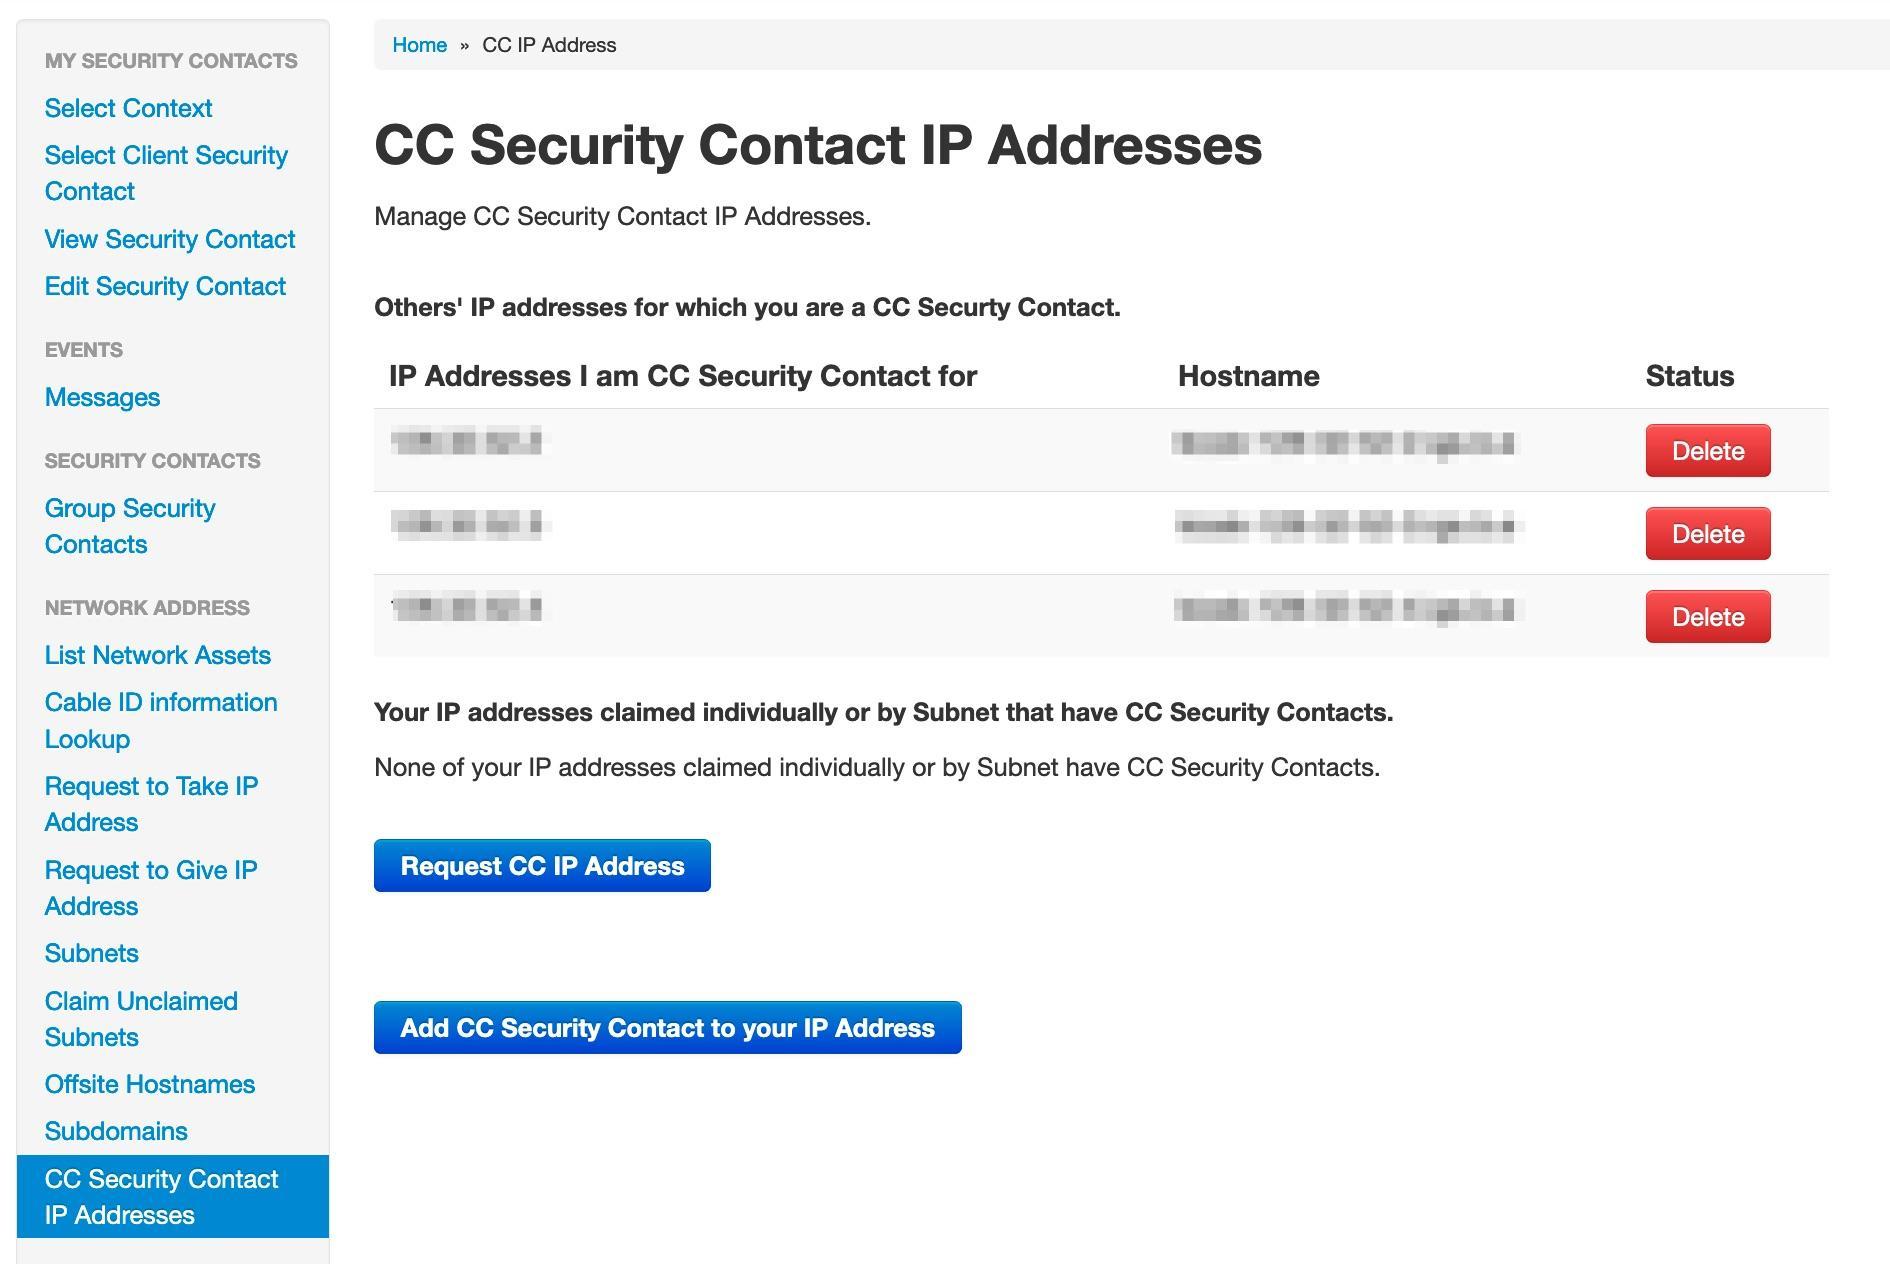 CC Security Contact IP Addresses